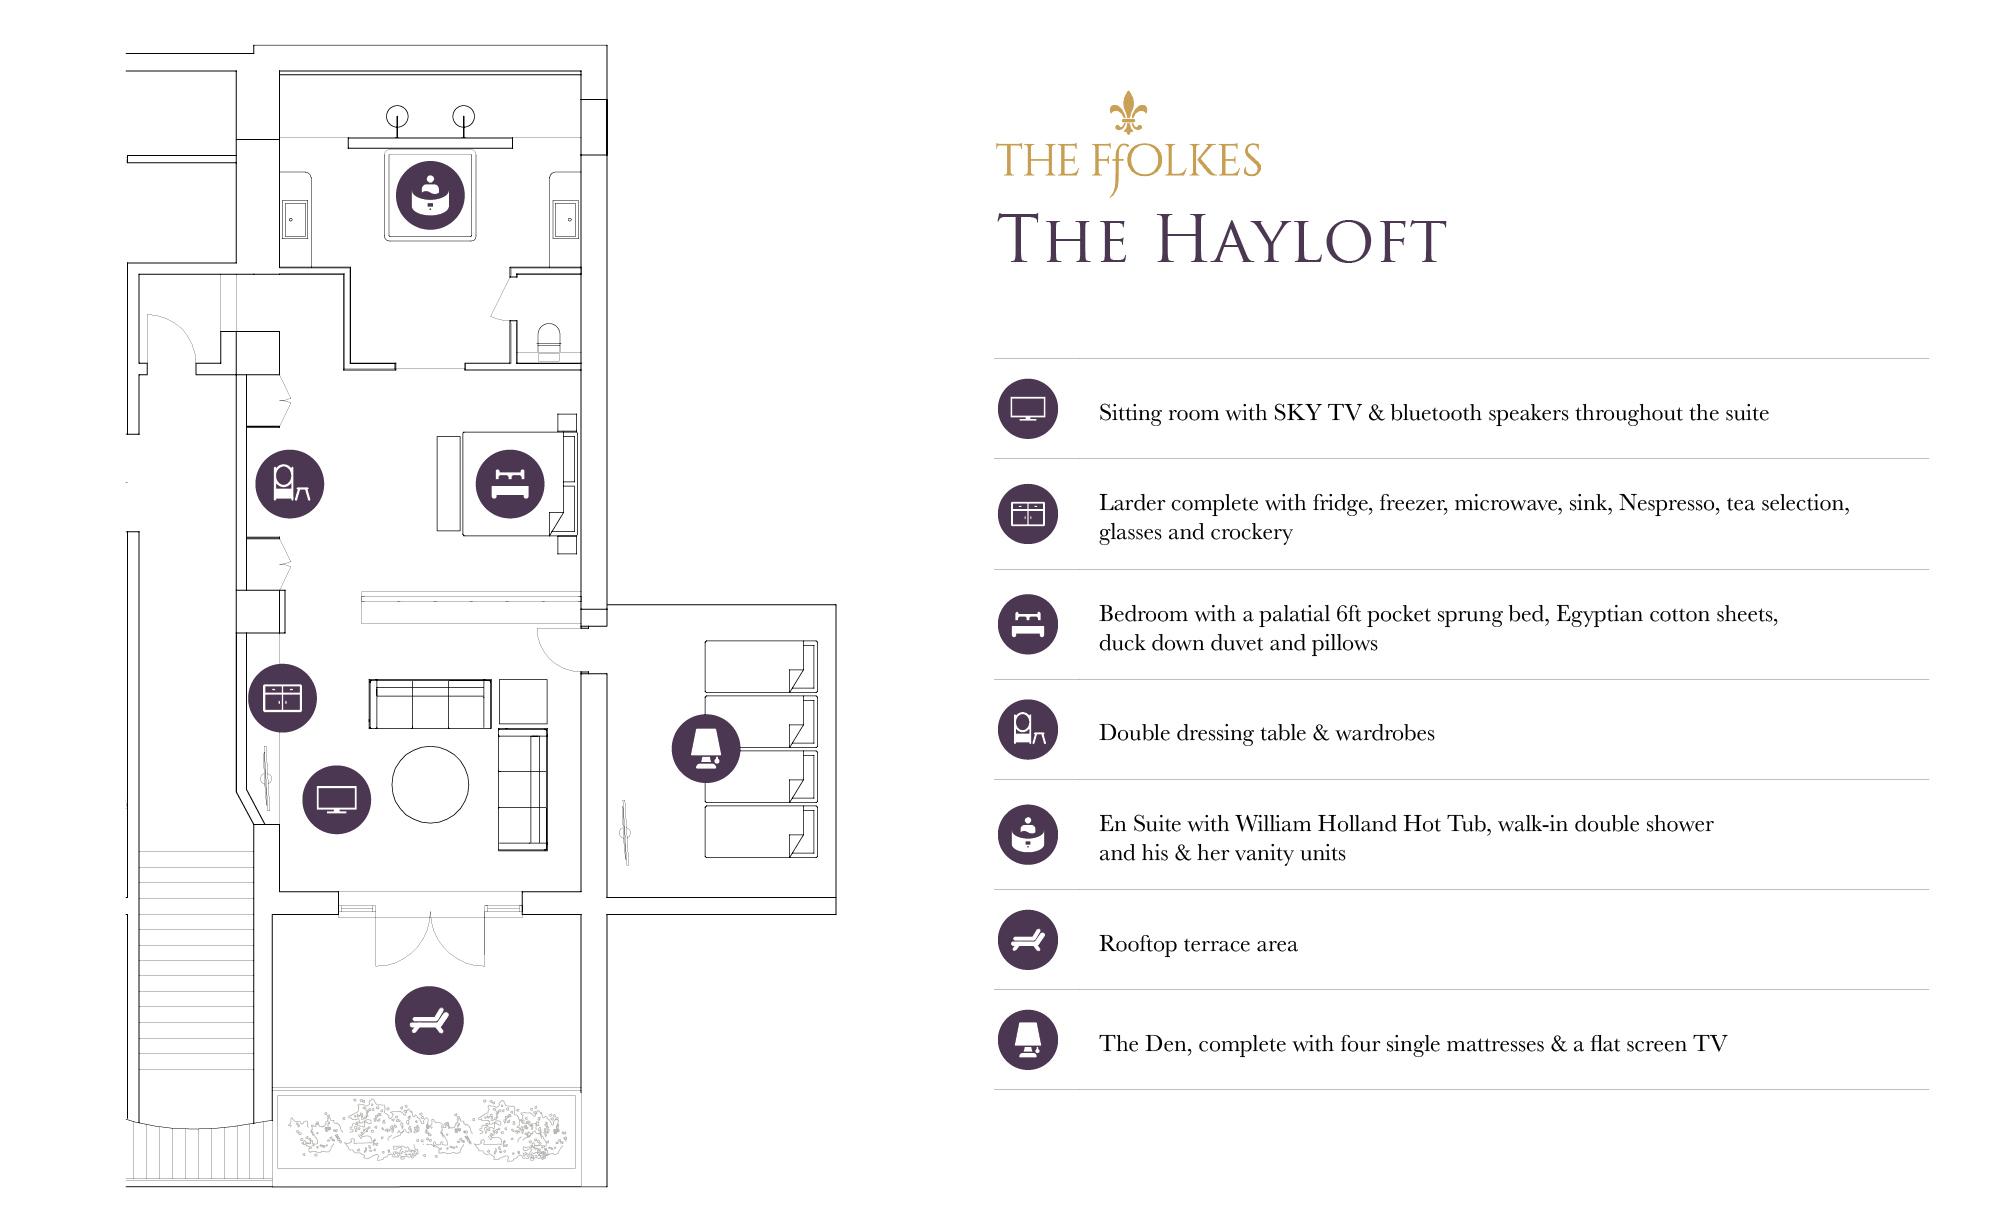 WR_TheFfolkes_TheHayloft_Floorplan_2000x1230px.jpg#asset:3105